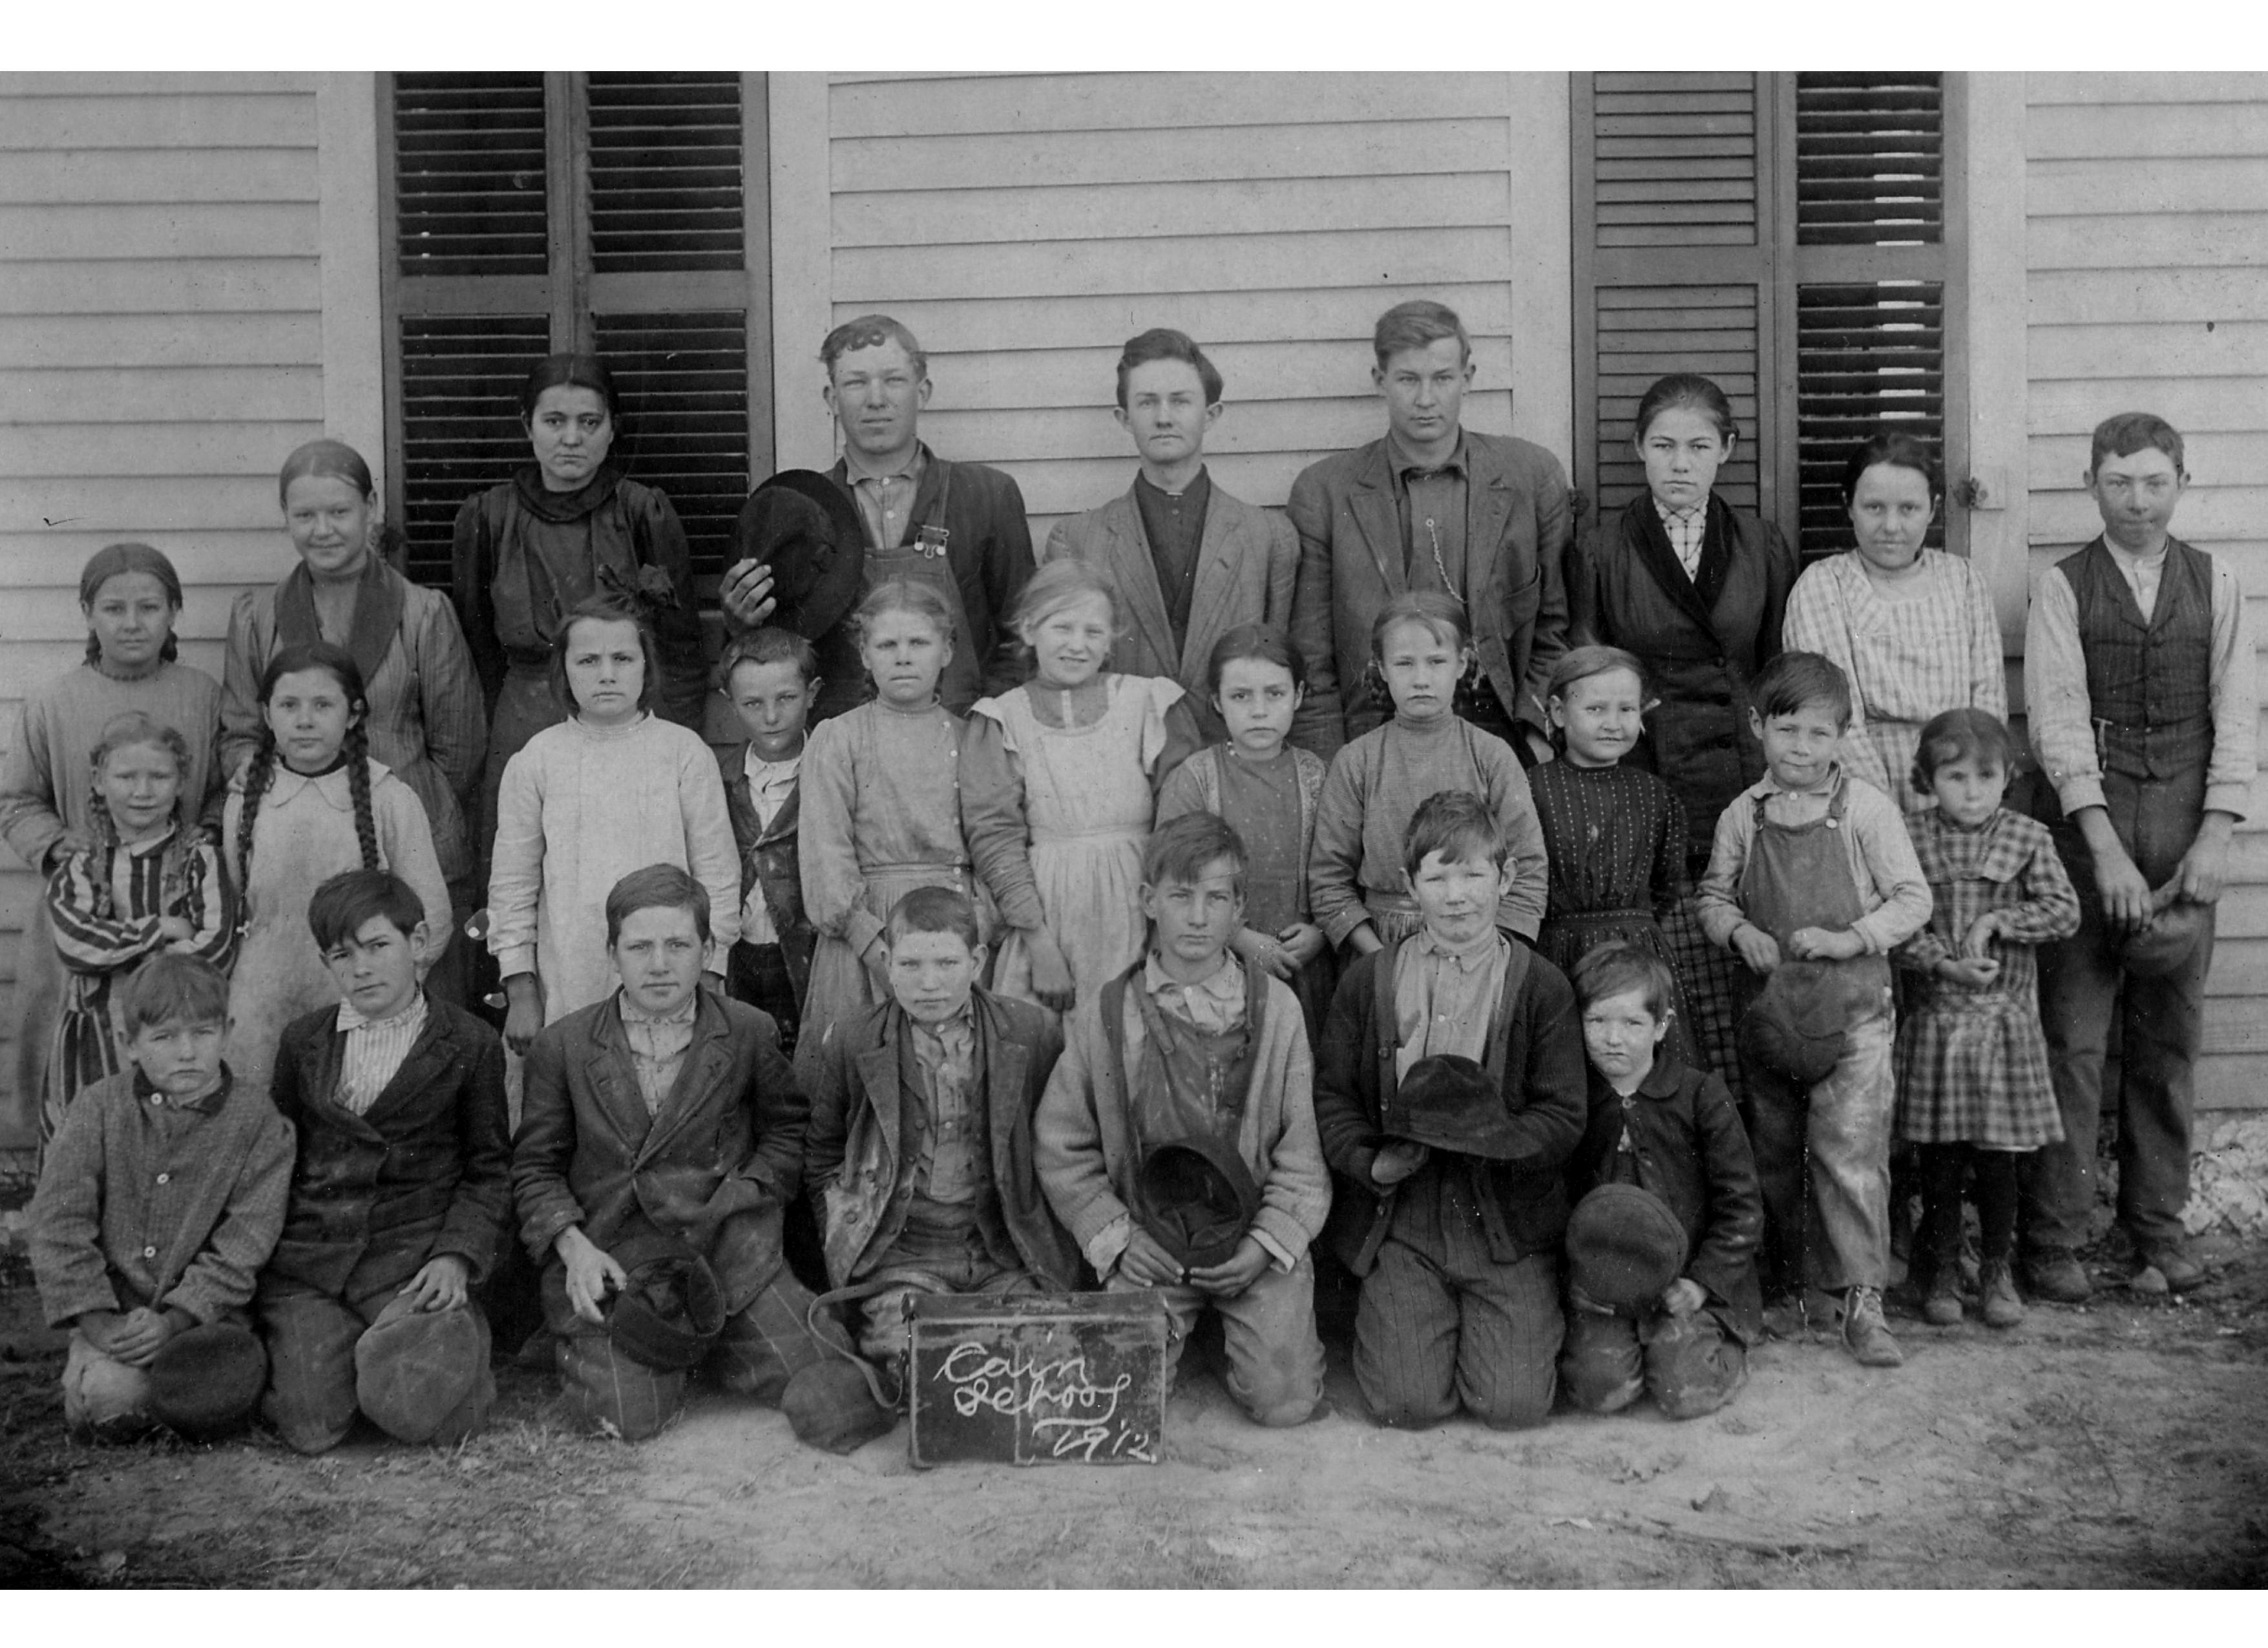 Crawford County Arkansas Photo Gallery